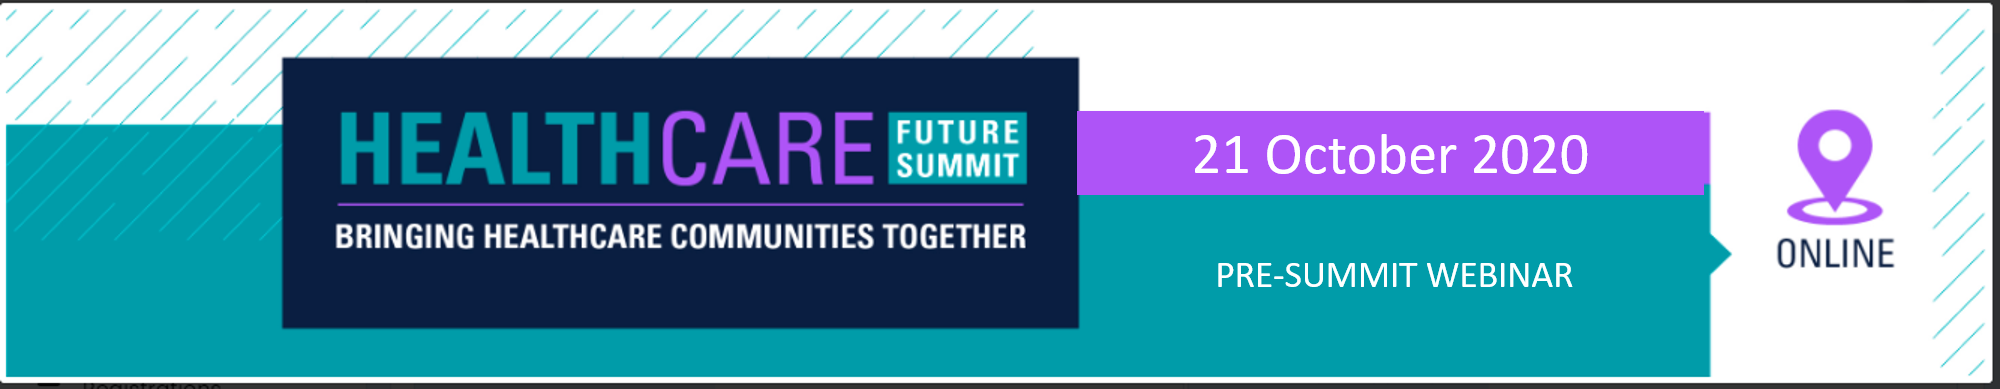 Healthcare Future Summit (OCT 21, 2020)